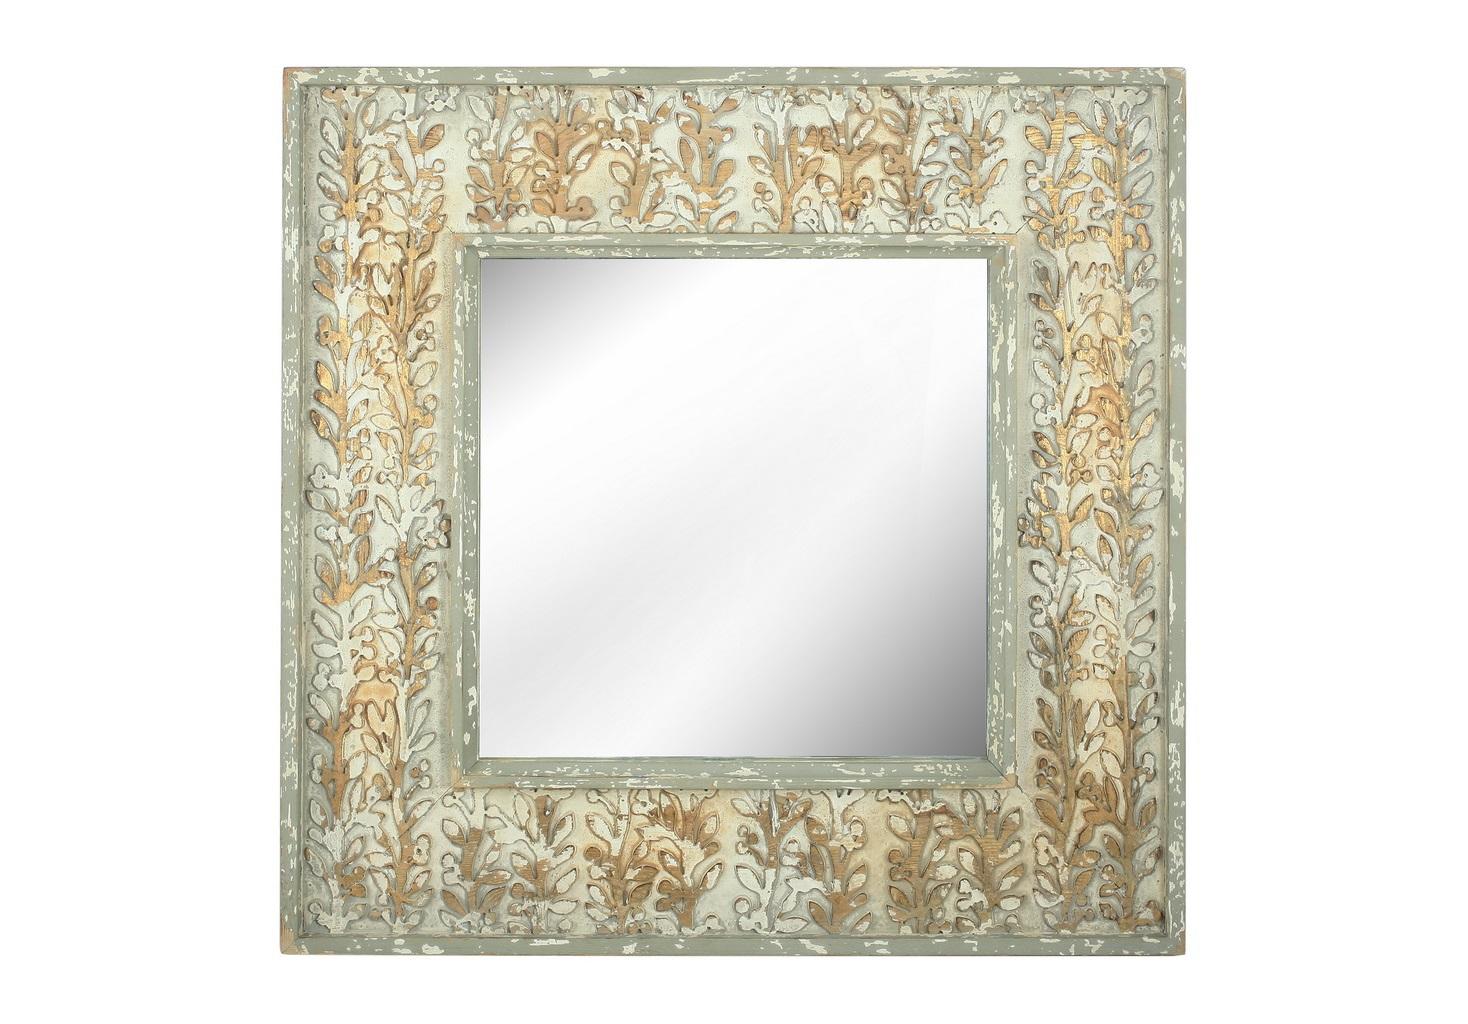 Зеркало настенноеНастенные зеркала<br><br><br>Material: Дерево<br>Width см: 93<br>Depth см: 6<br>Height см: 93